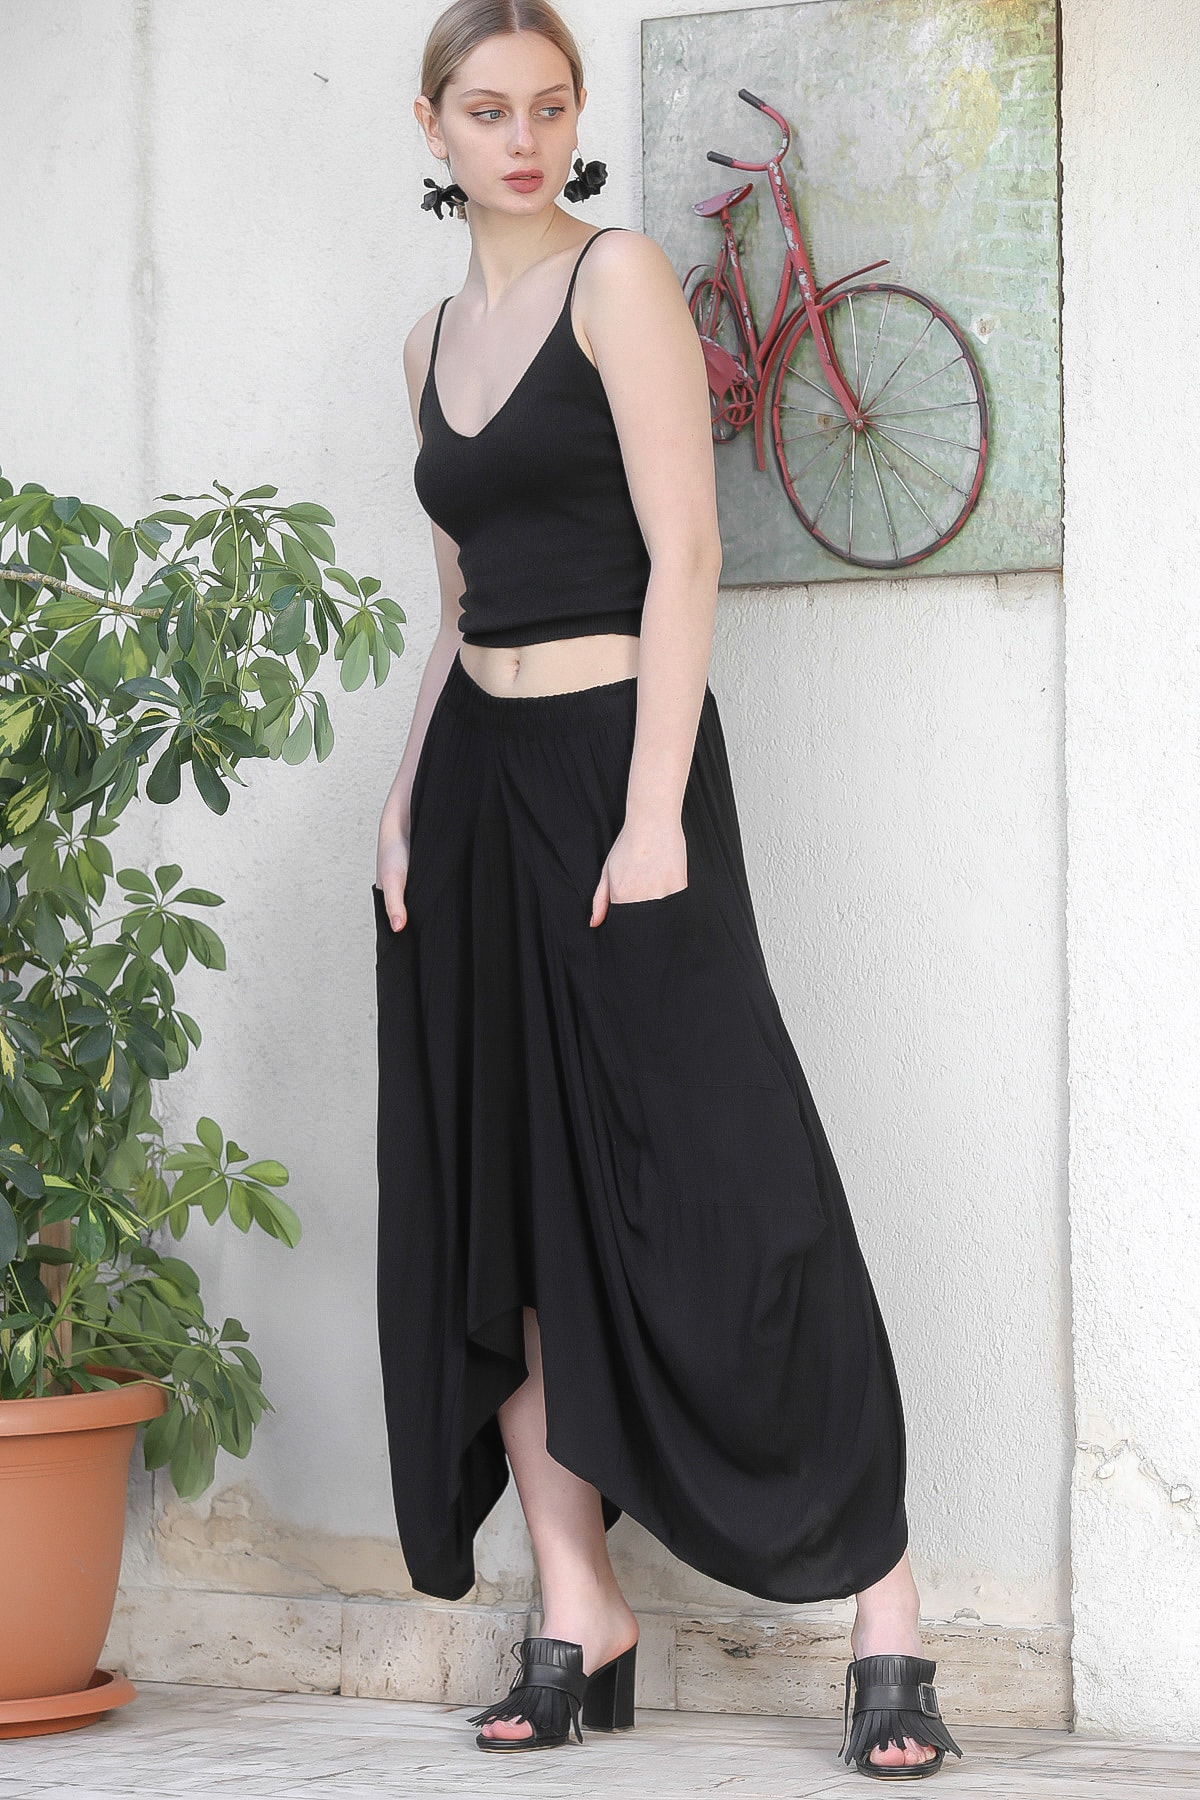 Chiccy Kadın Siyah Özel Tasarım Cep Detaylı Salaş Dokuma Pantolon M10060000PN98842